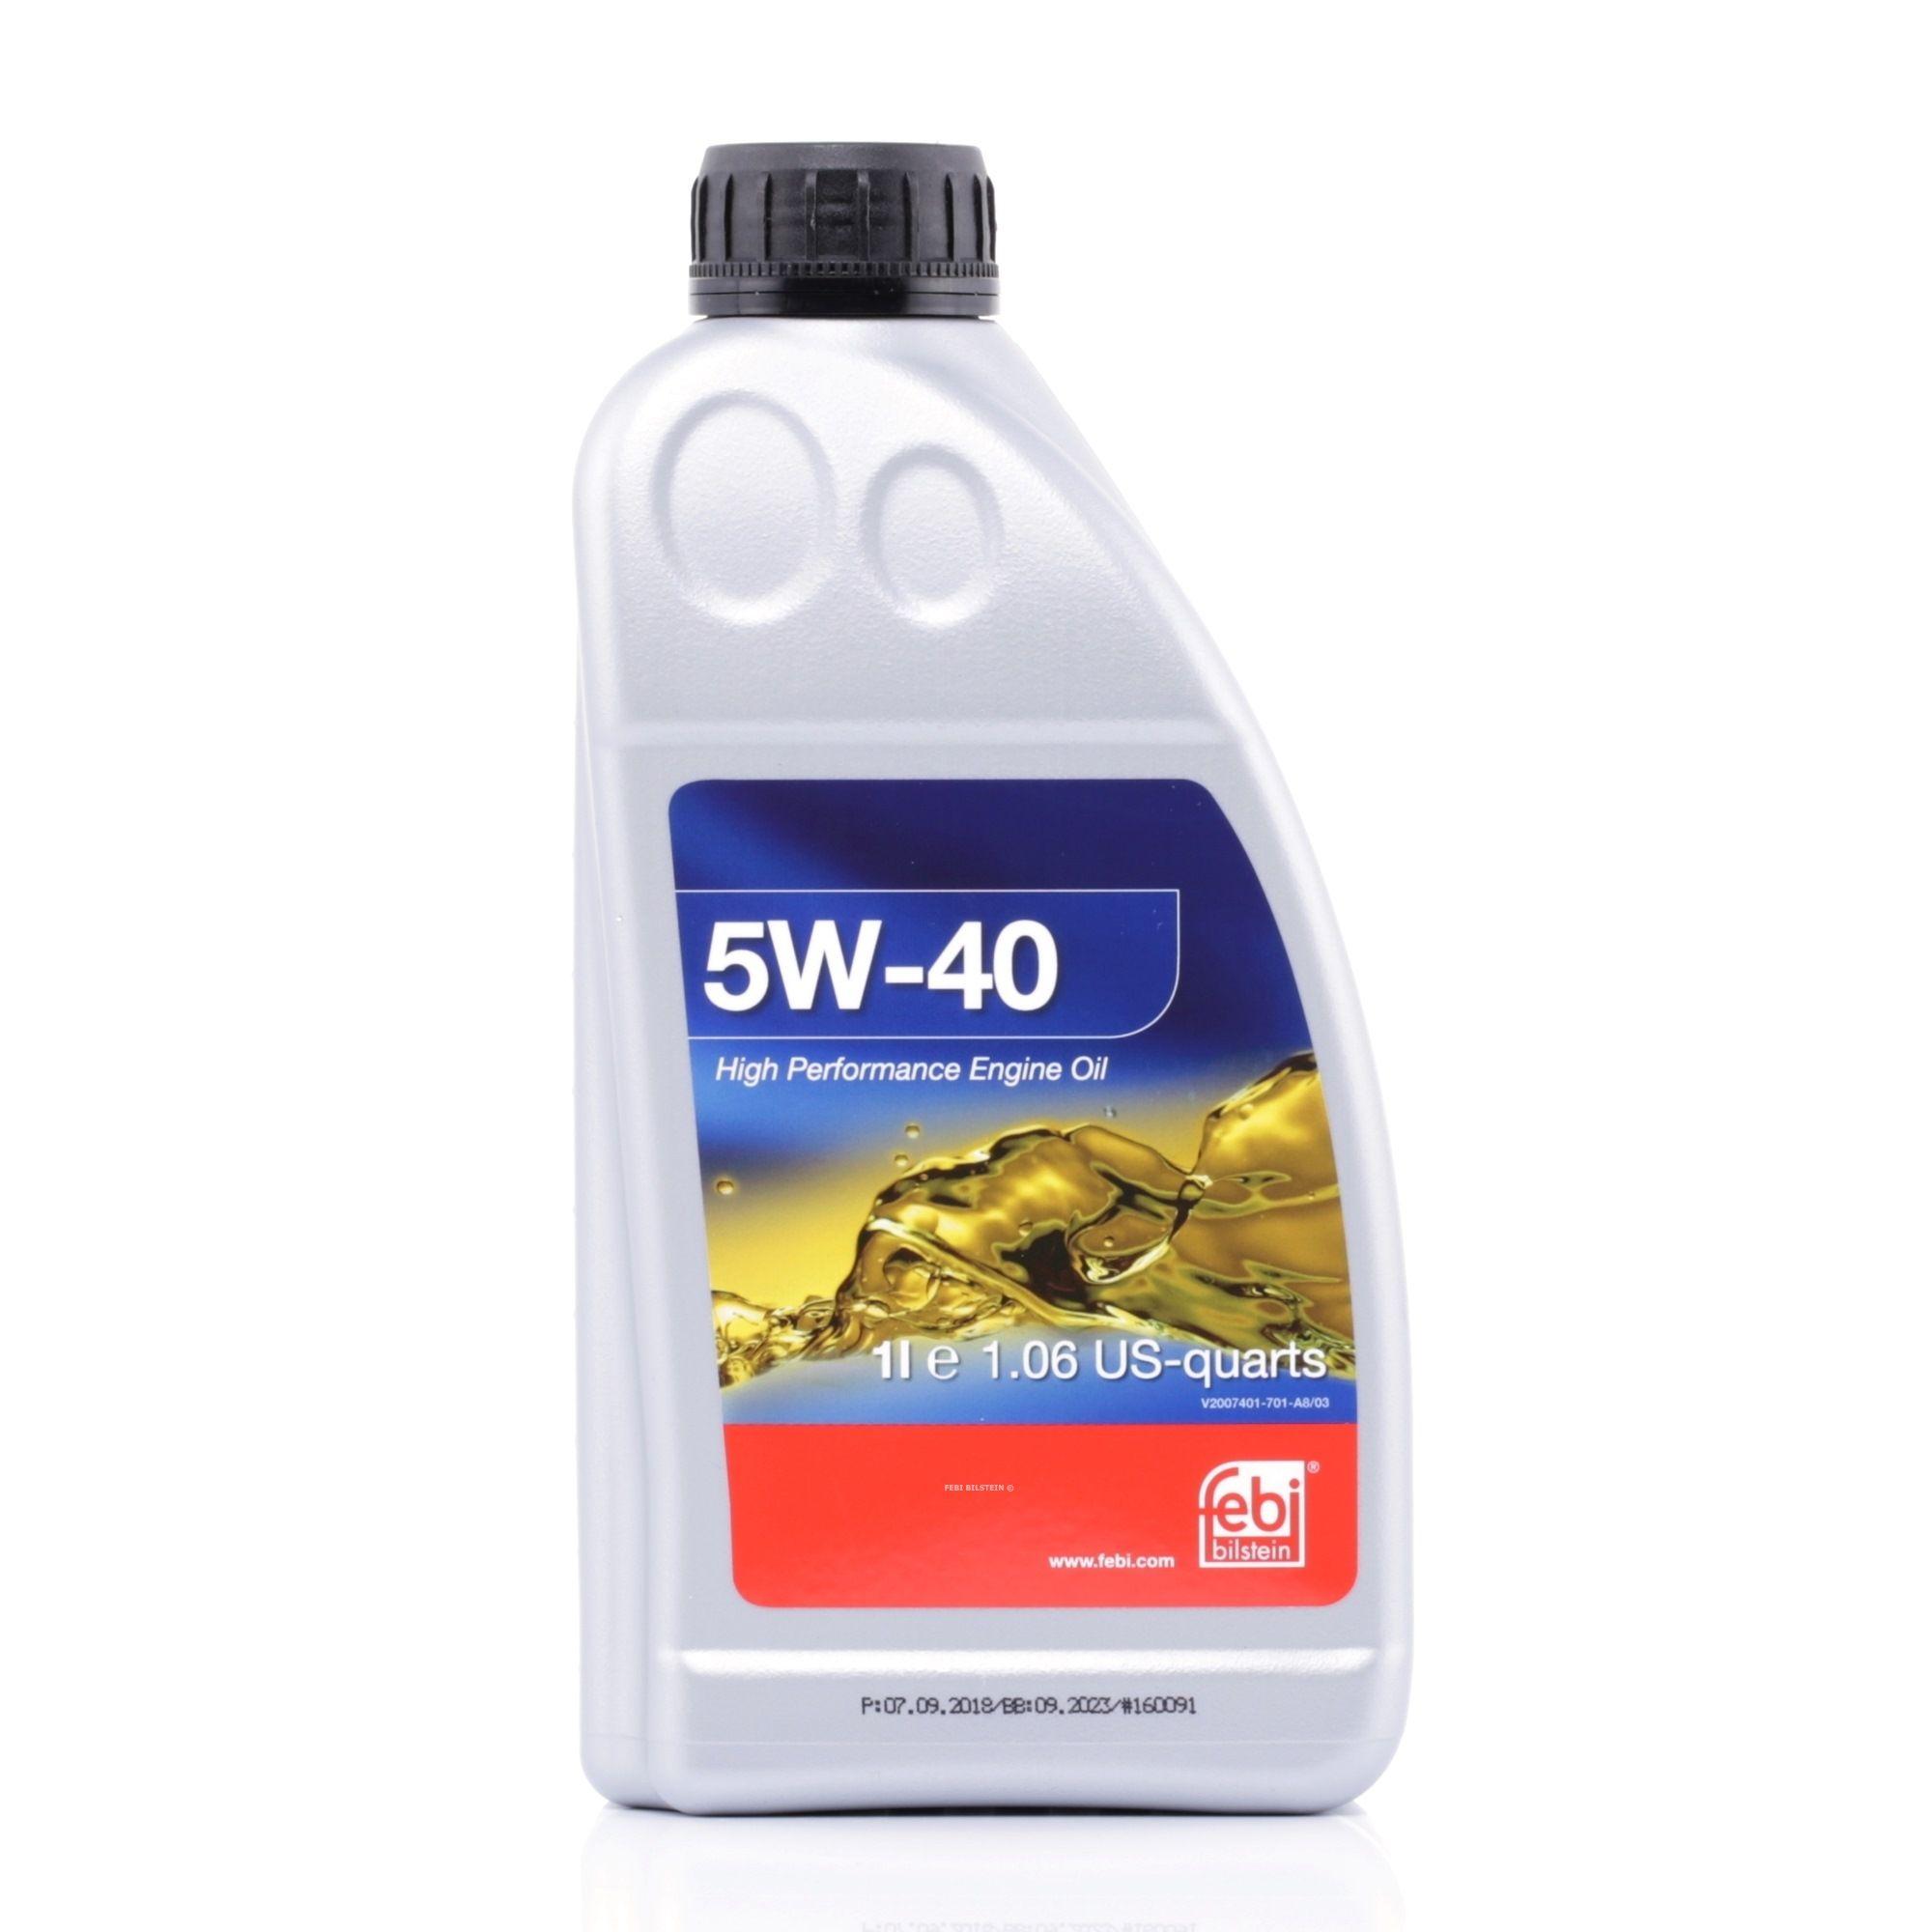 VW50500 FEBI BILSTEIN 5W-40, 1l, Synthetiköl Motoröl 32936 günstig kaufen